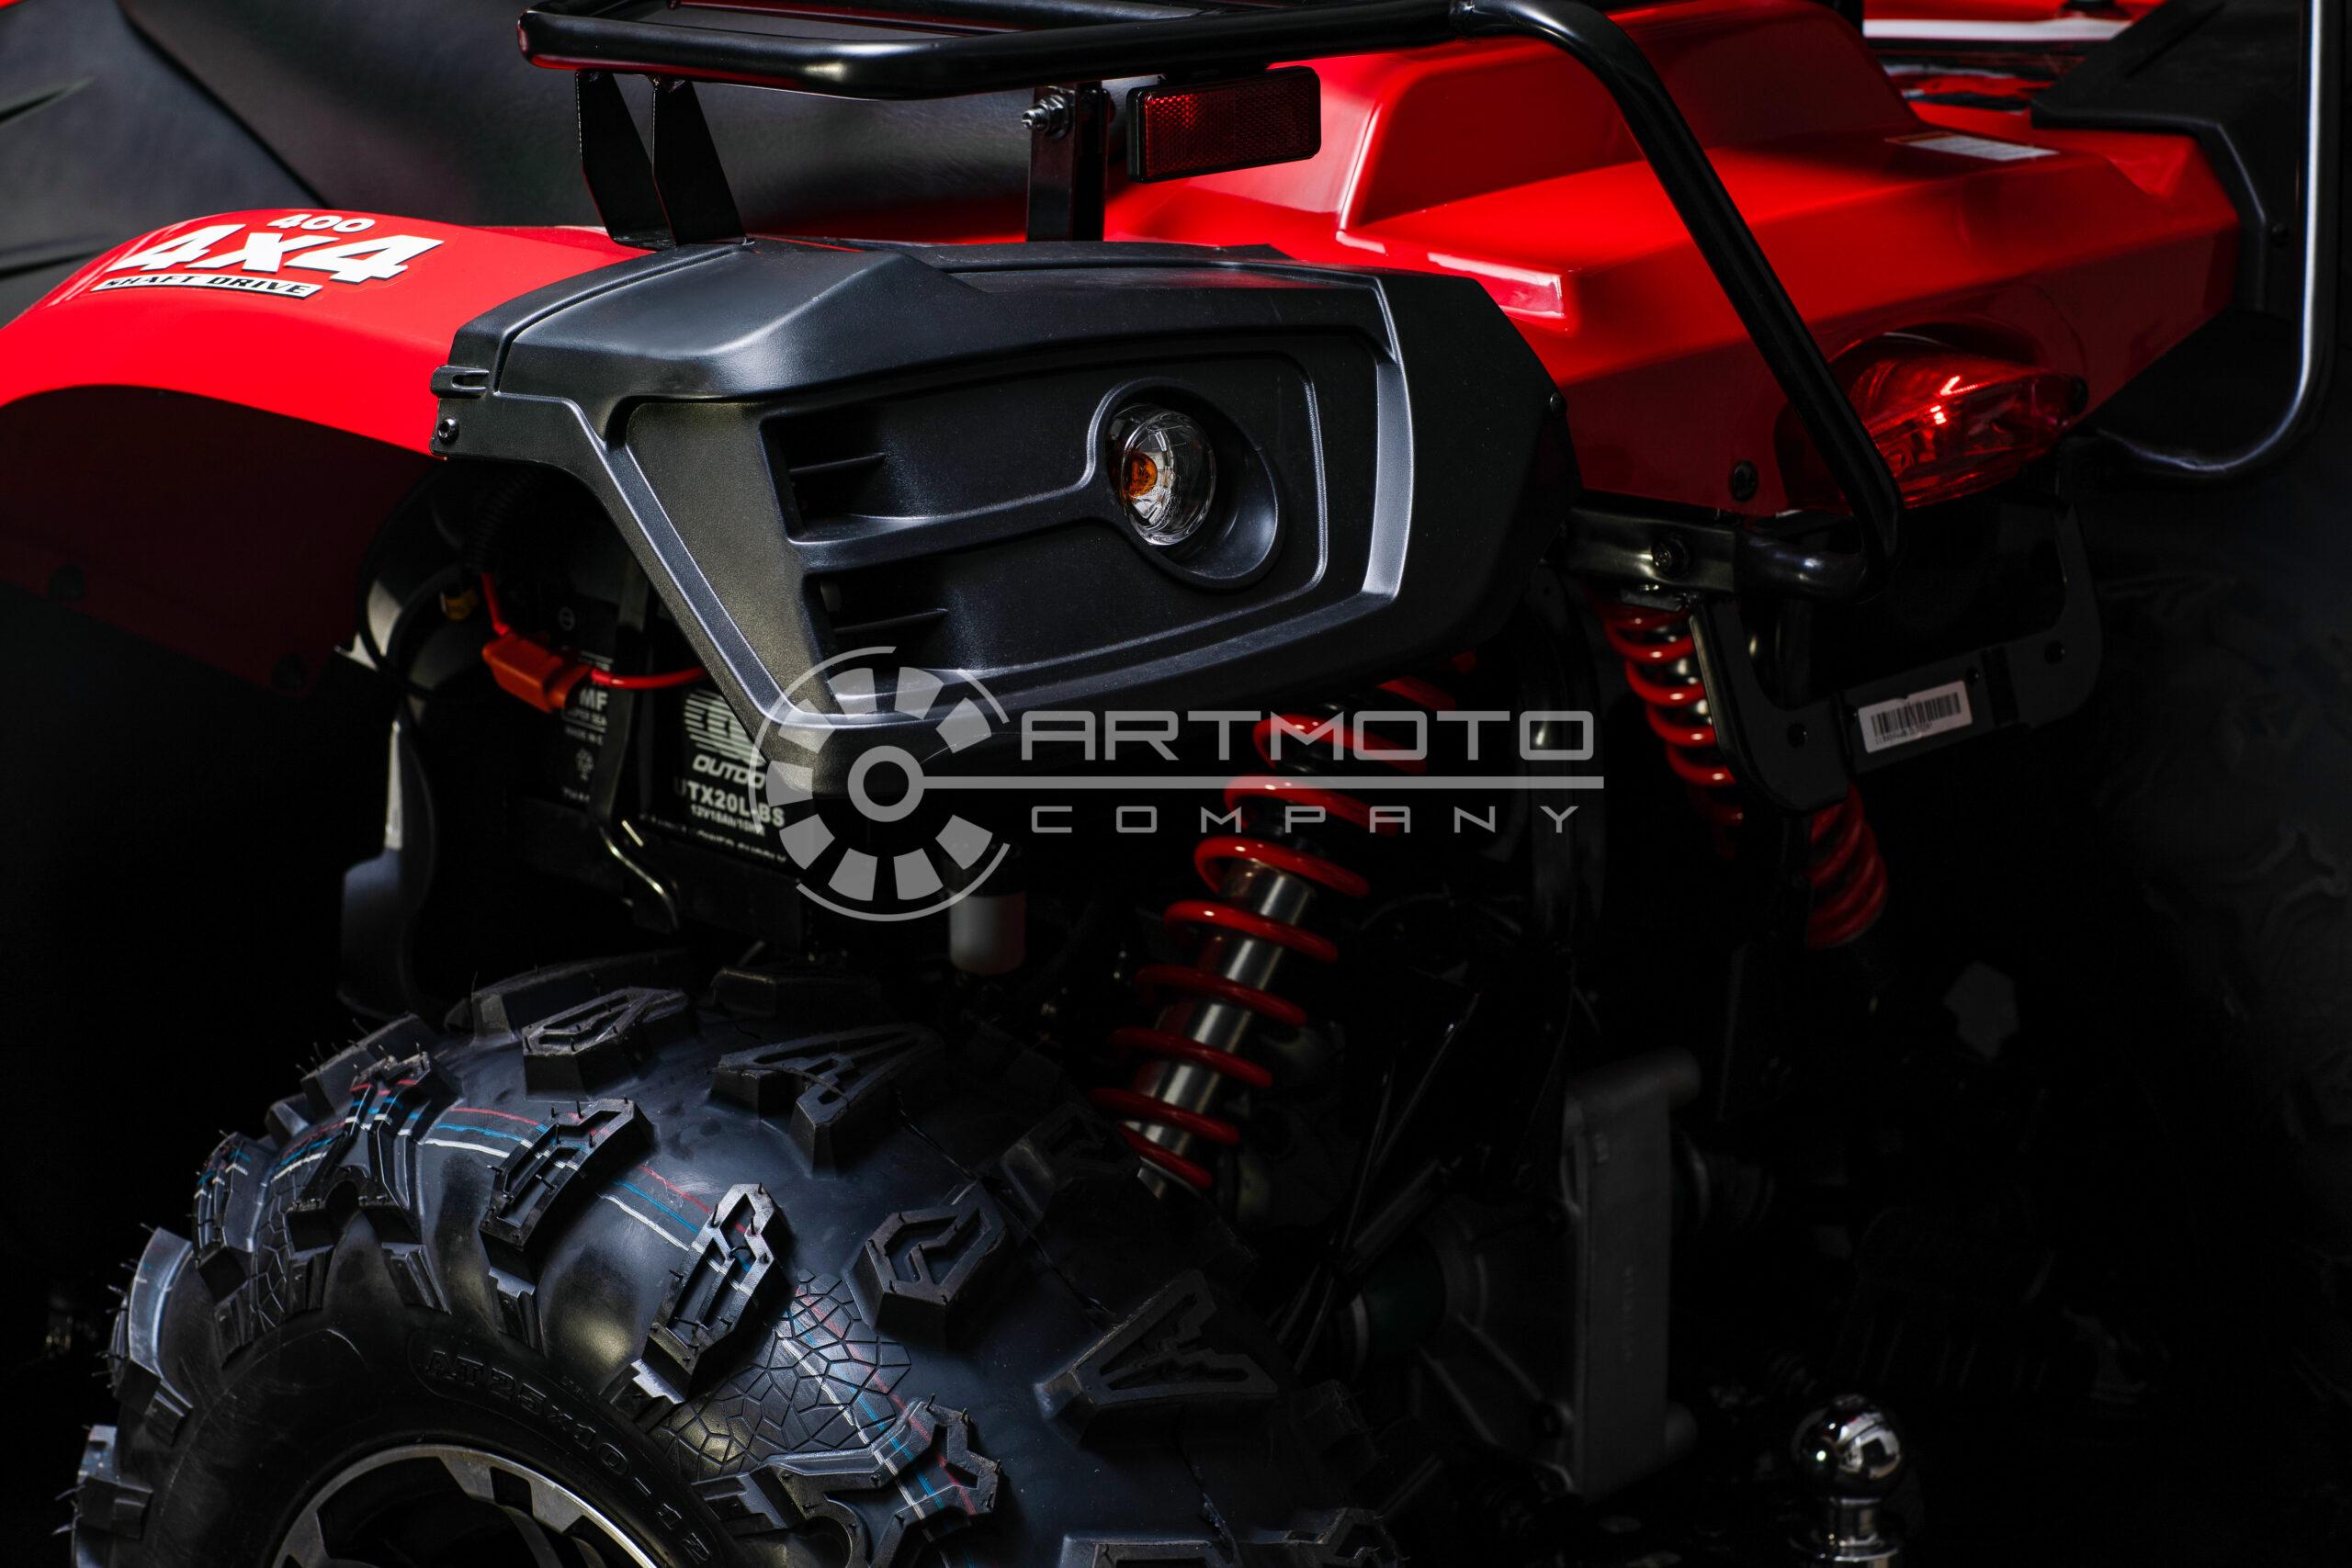 КВАДРОЦИКЛ LINHAI LH 400 ATV-D  Артмото - купить квадроцикл в украине и харькове, мотоцикл, снегоход, скутер, мопед, электромобиль